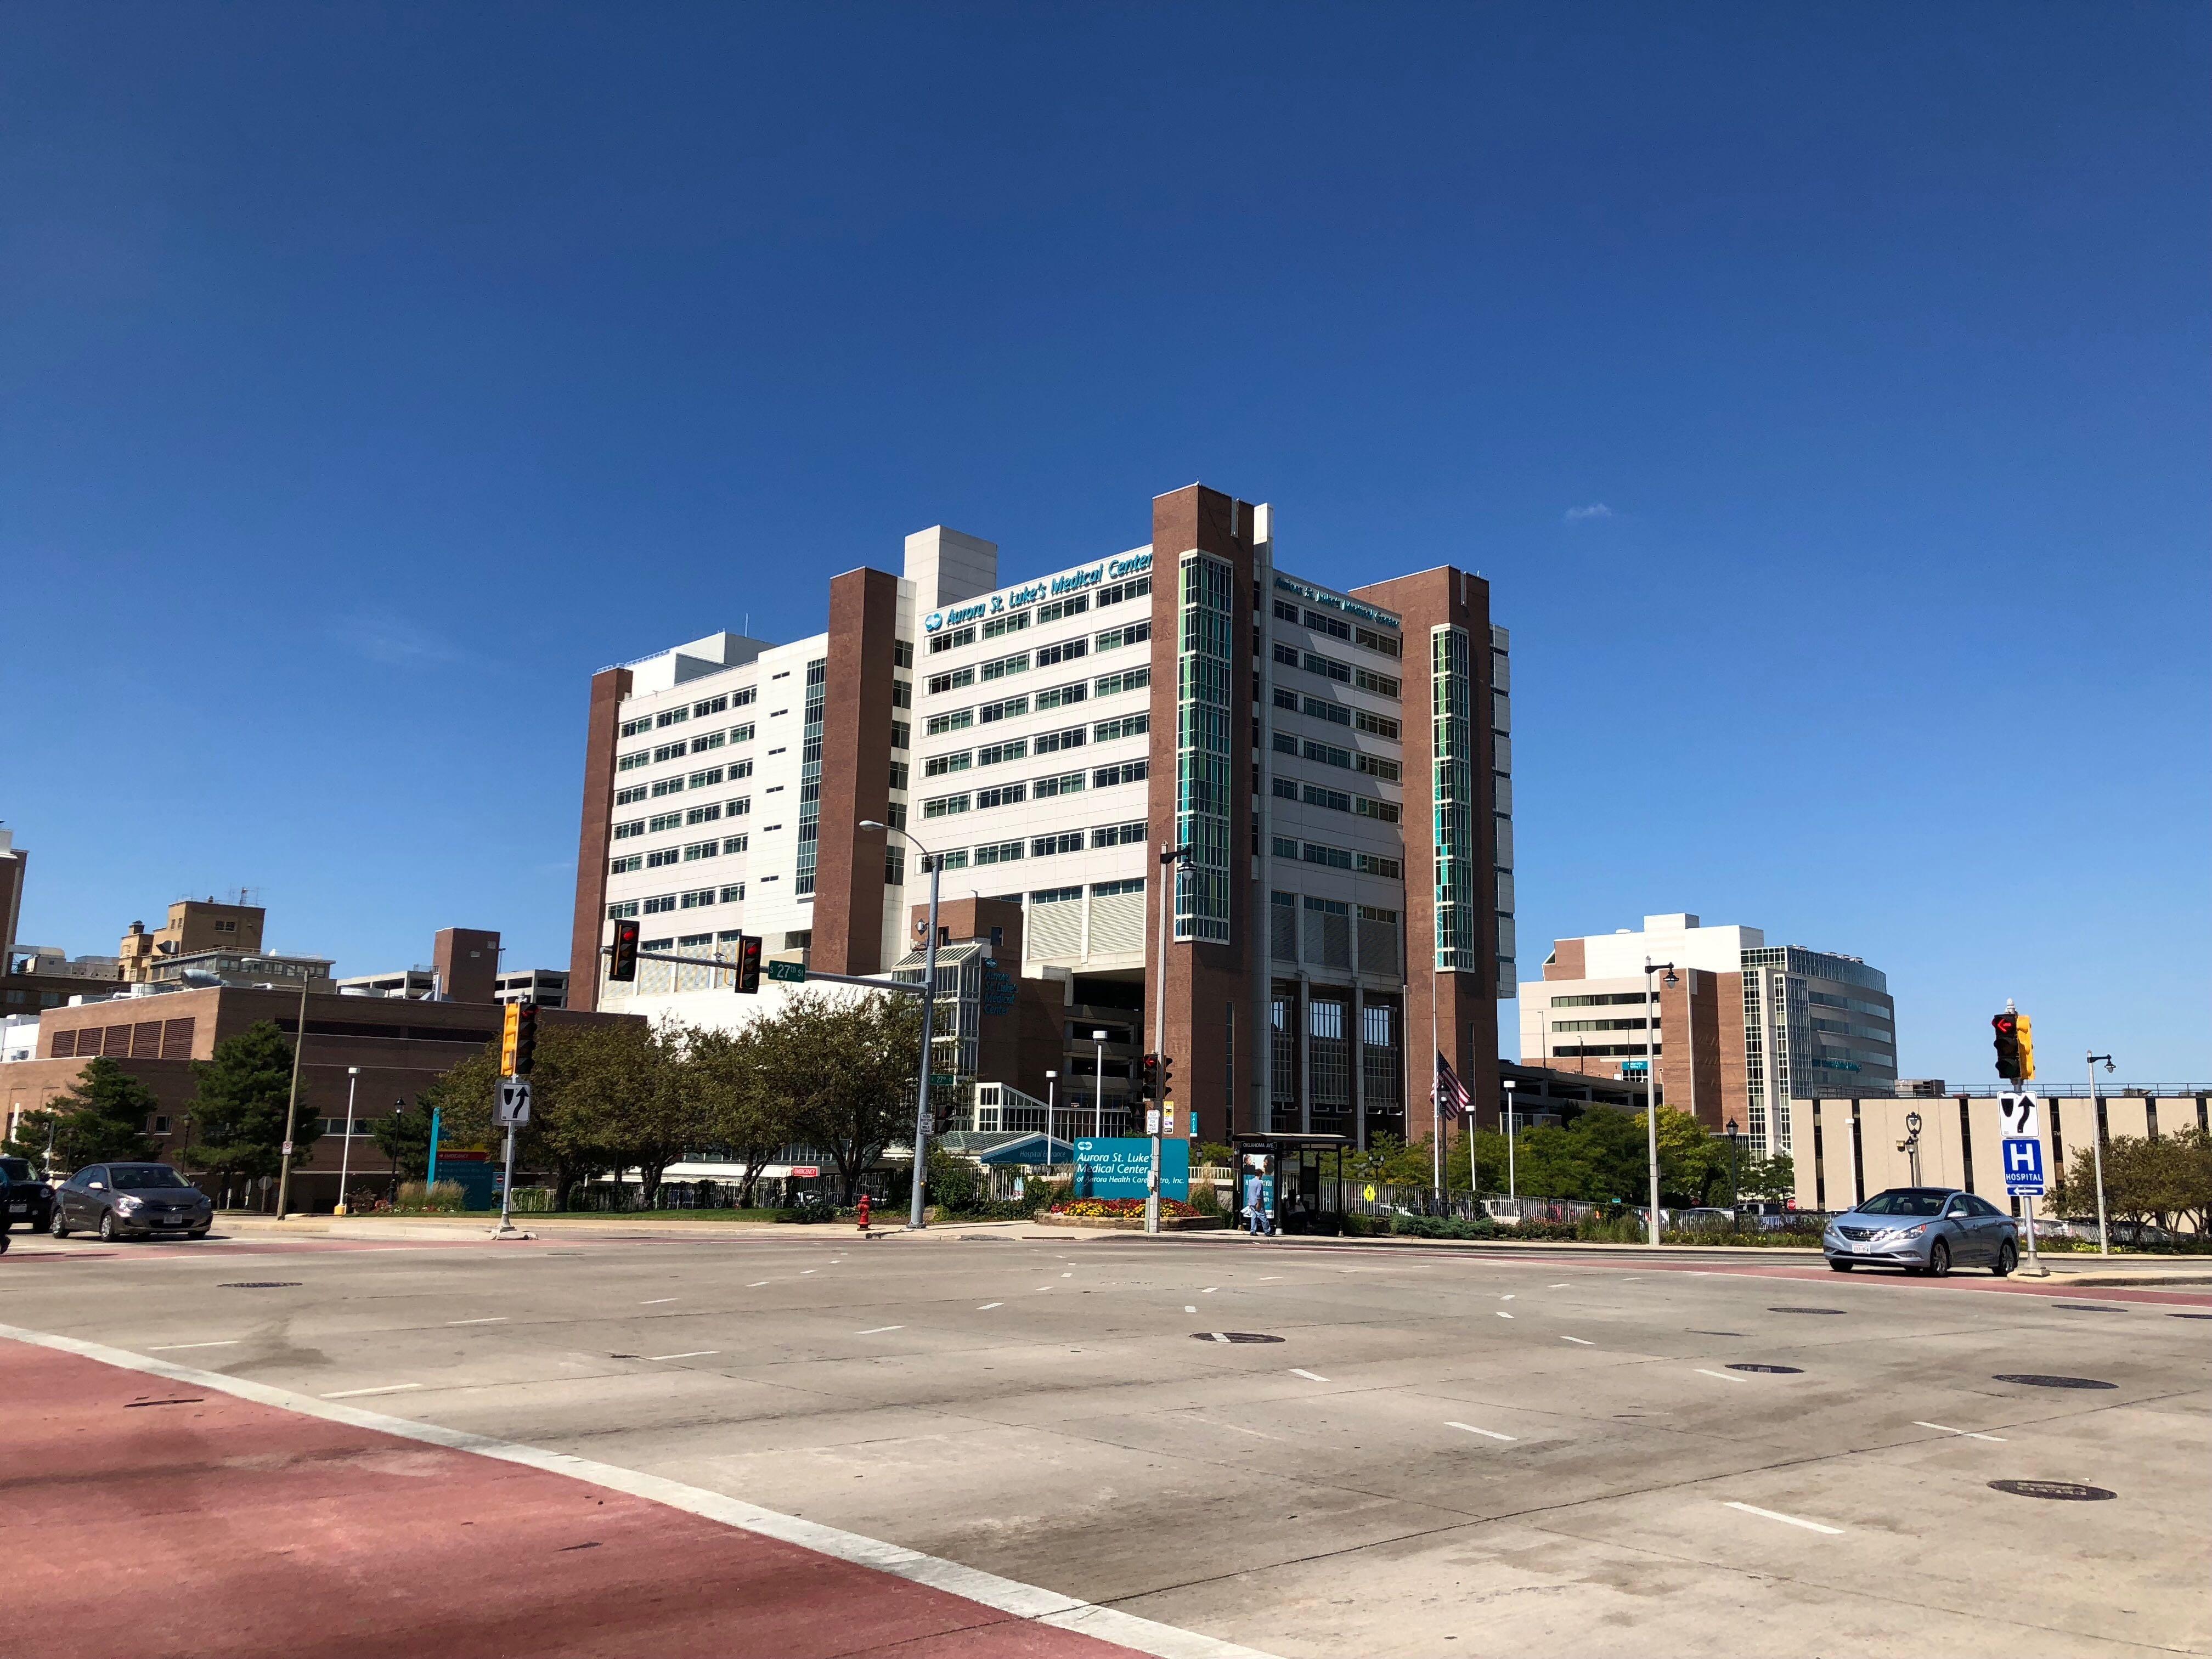 St. Luke's Medical Center. Photo by Jeramey Jannene.